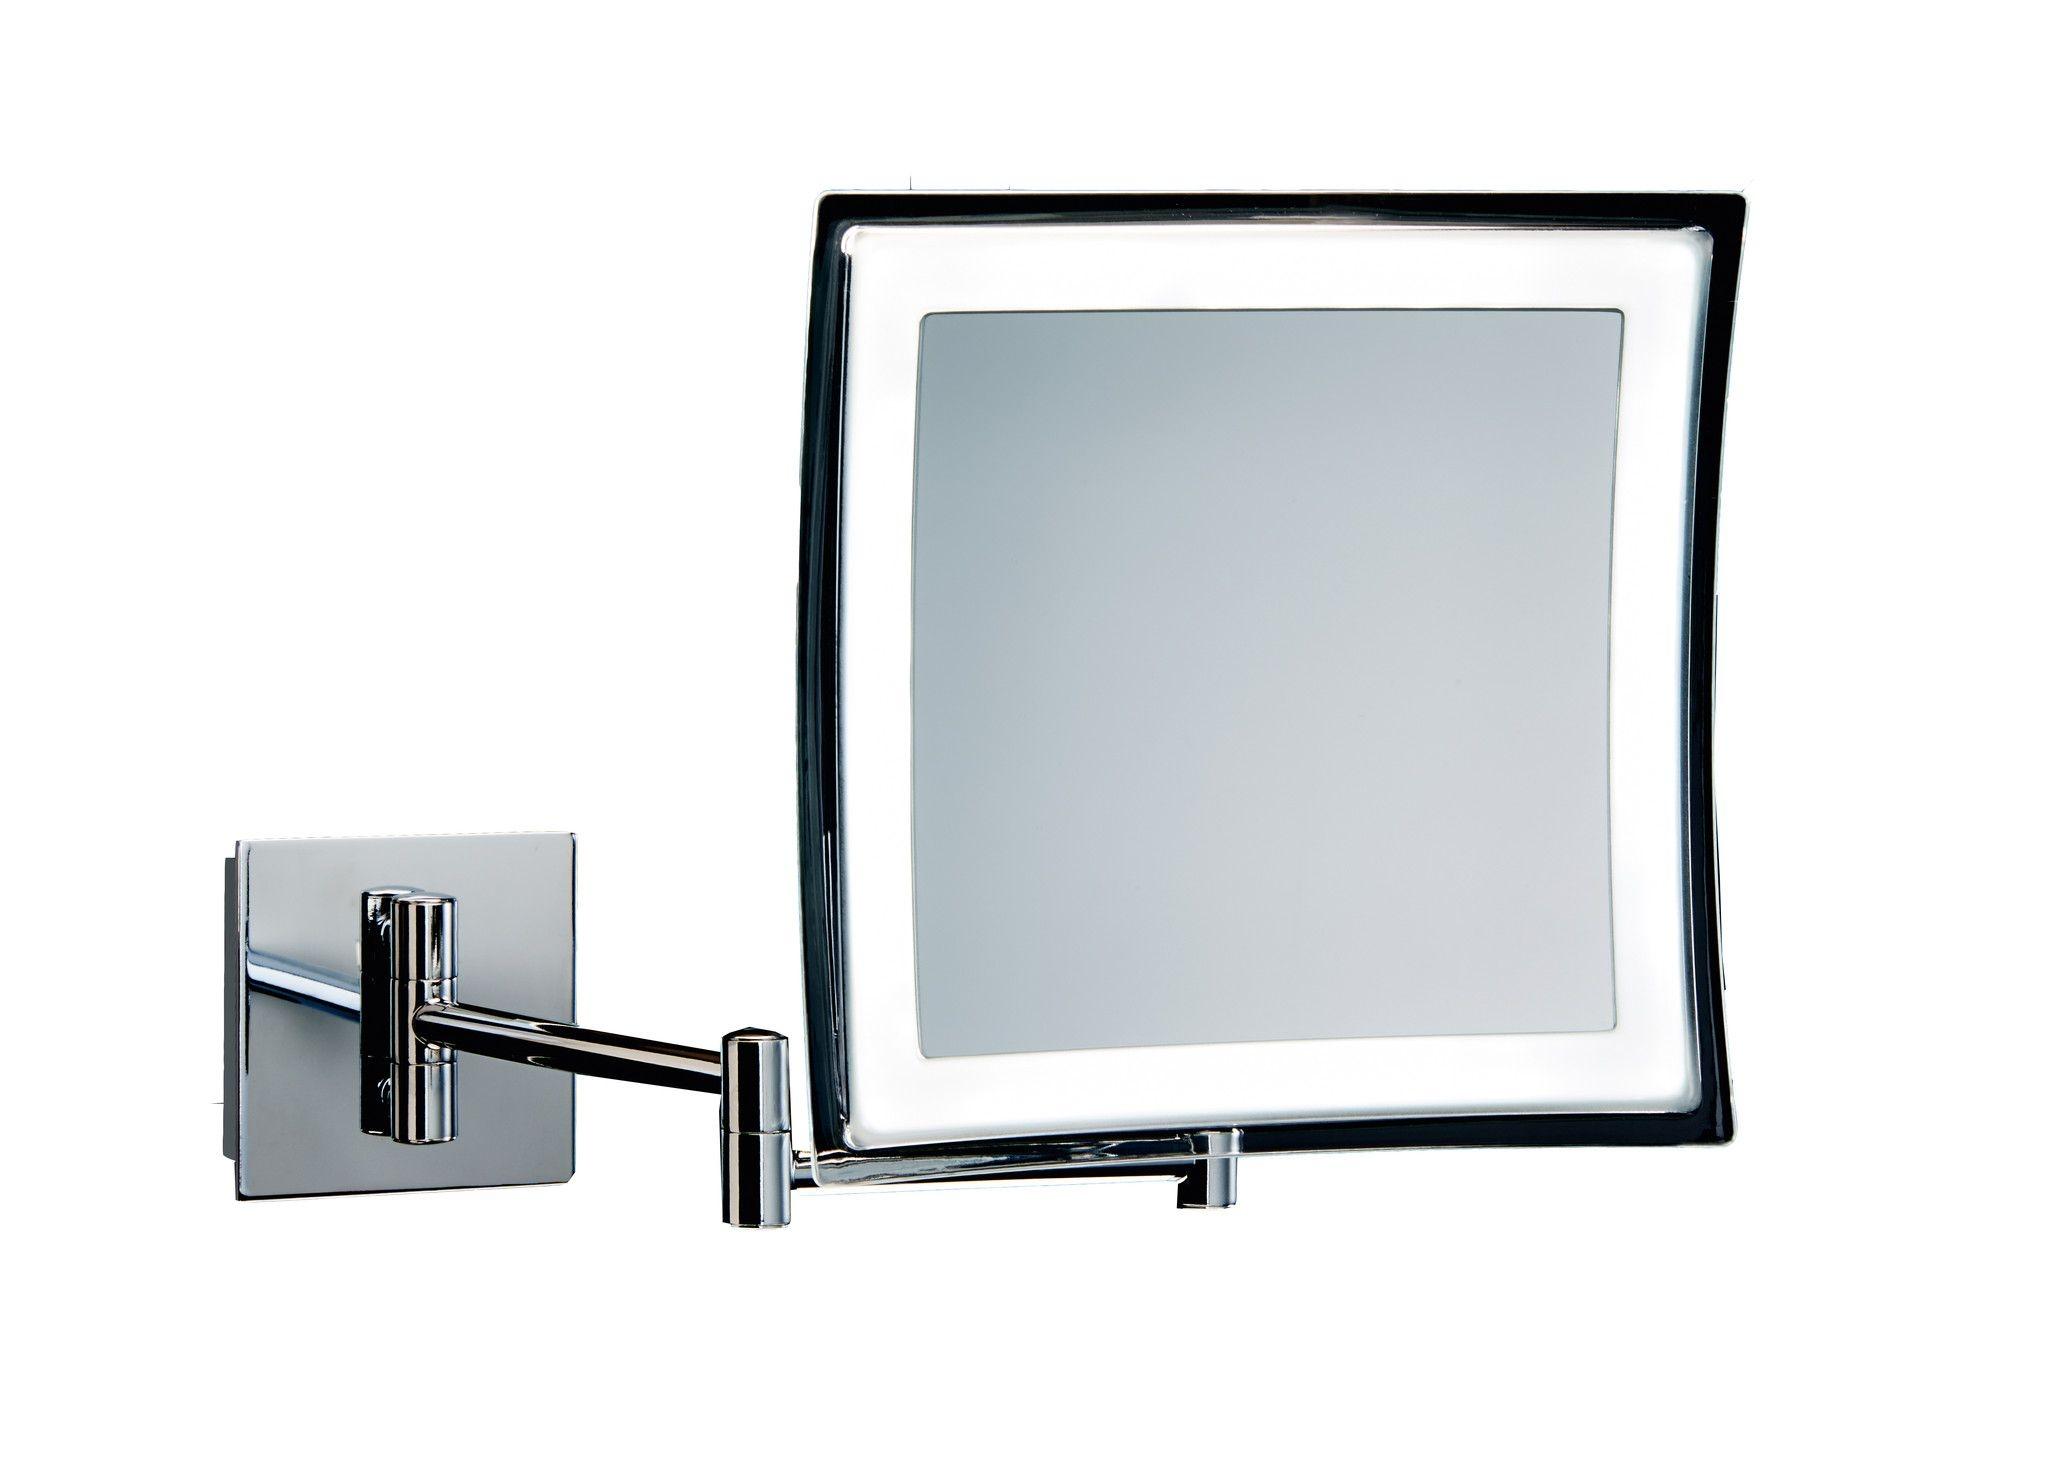 Led Wall Mount Mirror Chrome Led Wall Mount Mirror Chrome dwba square wall mounted cosmetic makeup 5x led light magnifying 2048 X 1465